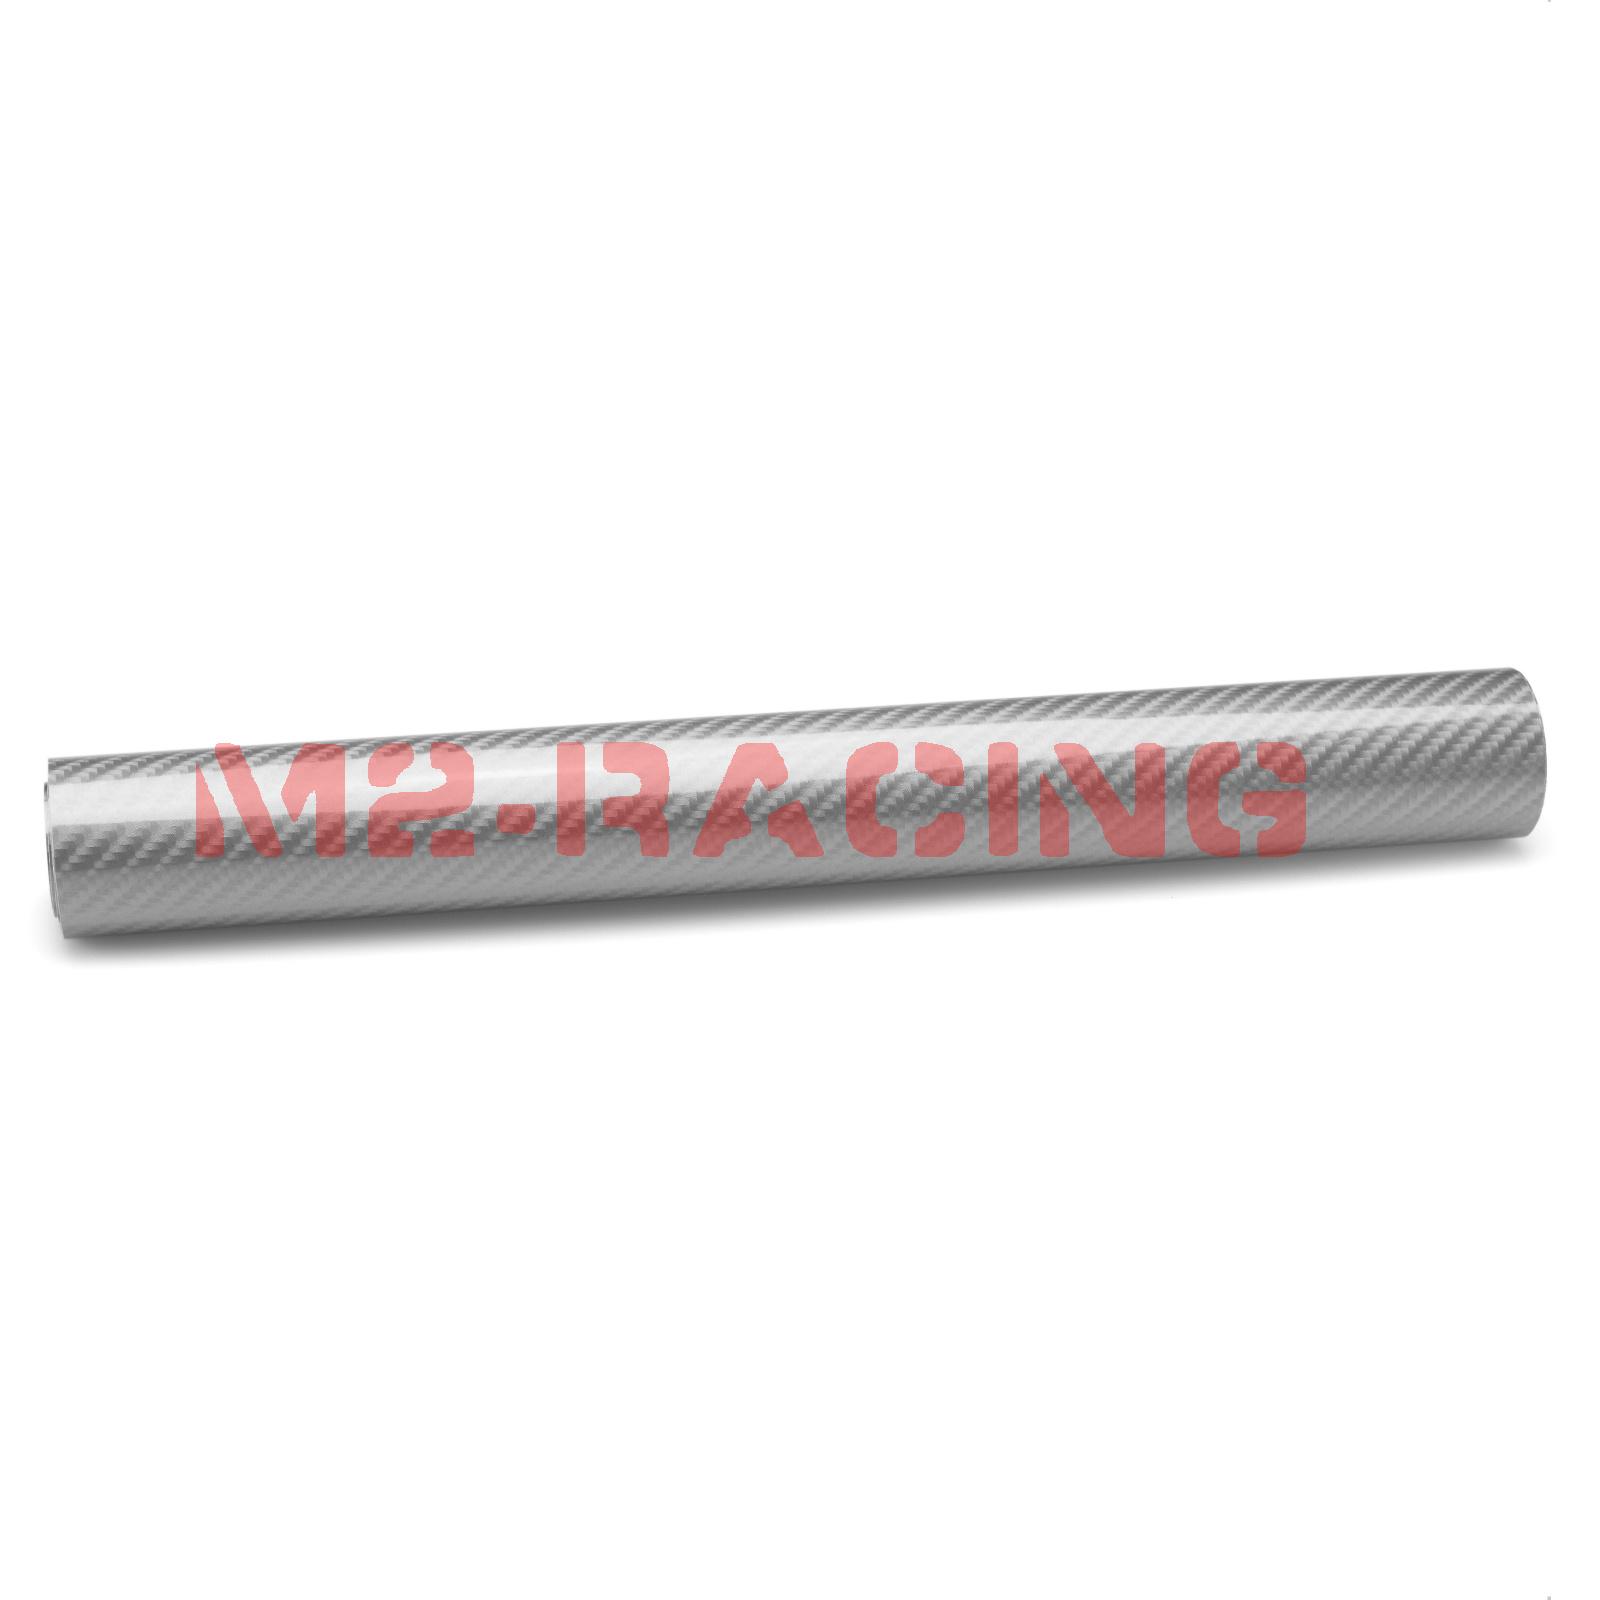 7D-Premium-High-Gloss-Carbon-Fiber-Vinyl-Wrap-Bubble-Free-Air-Release-Decal-6D